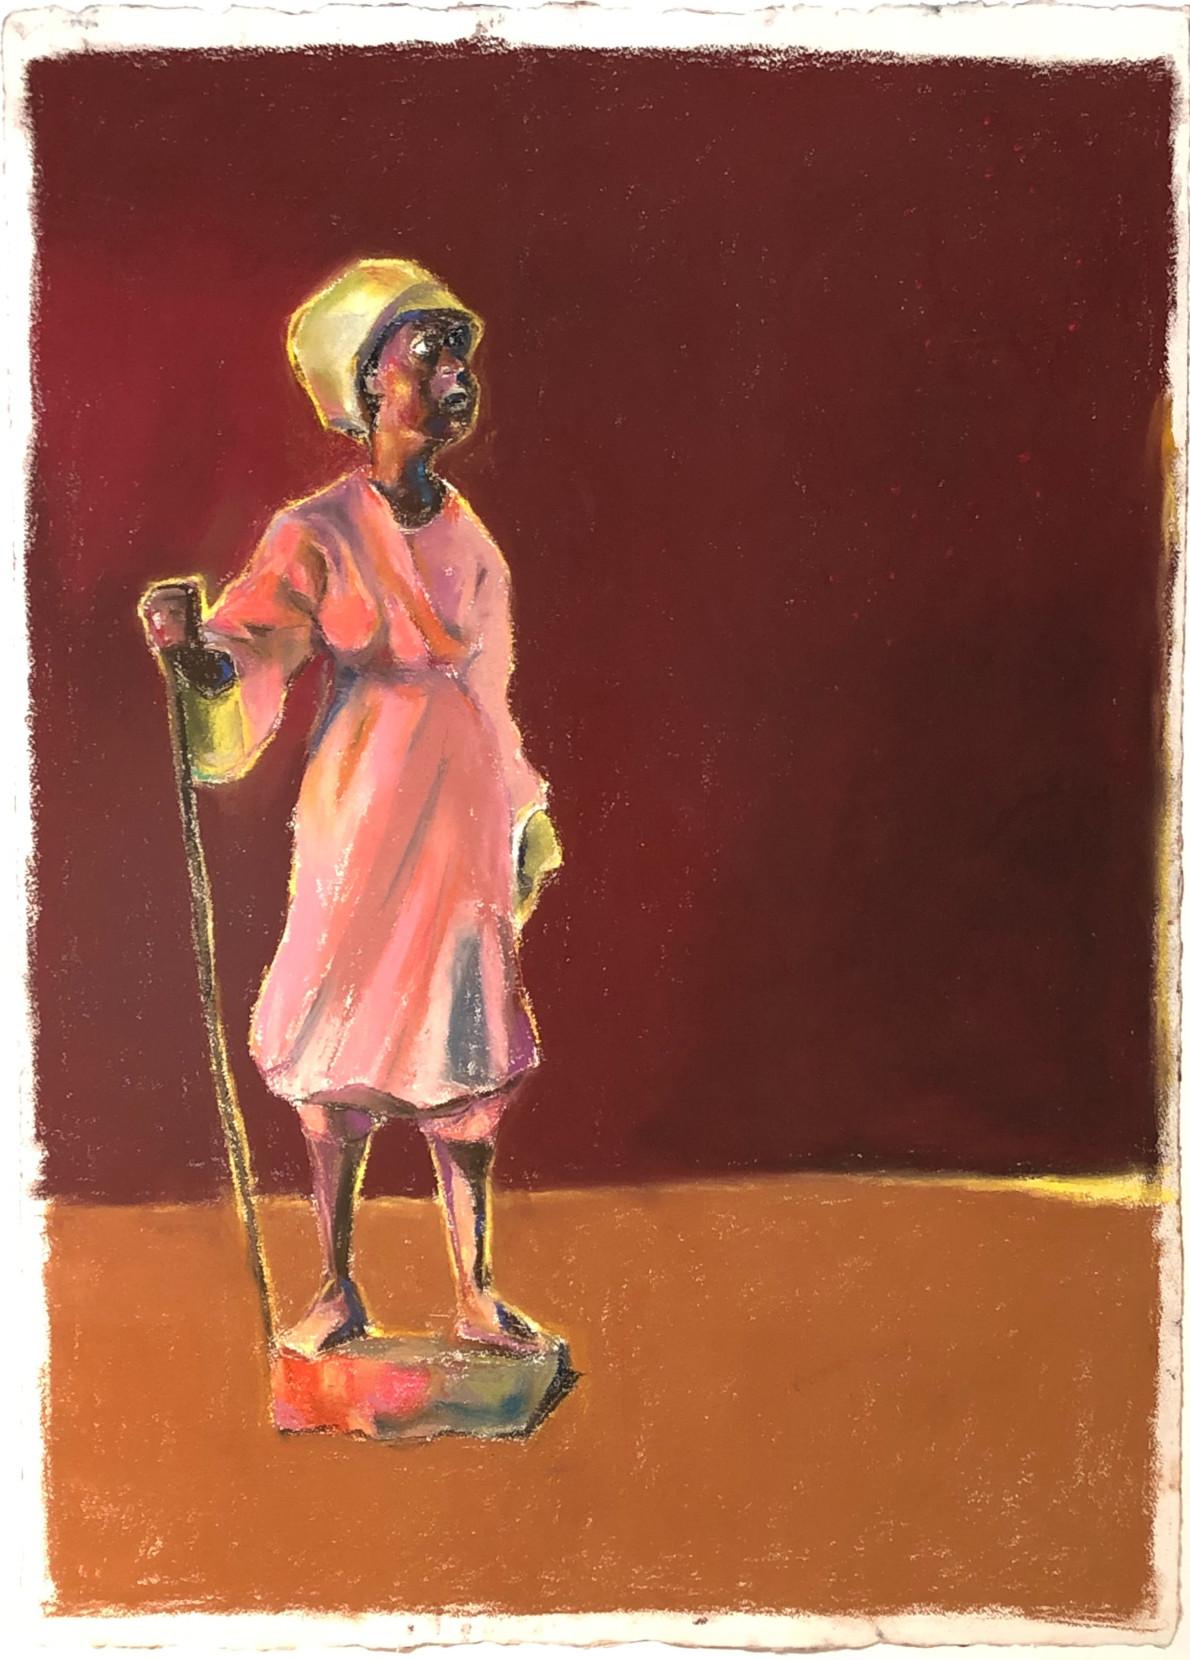 Paul Richards, Standing figure, still life, 2019